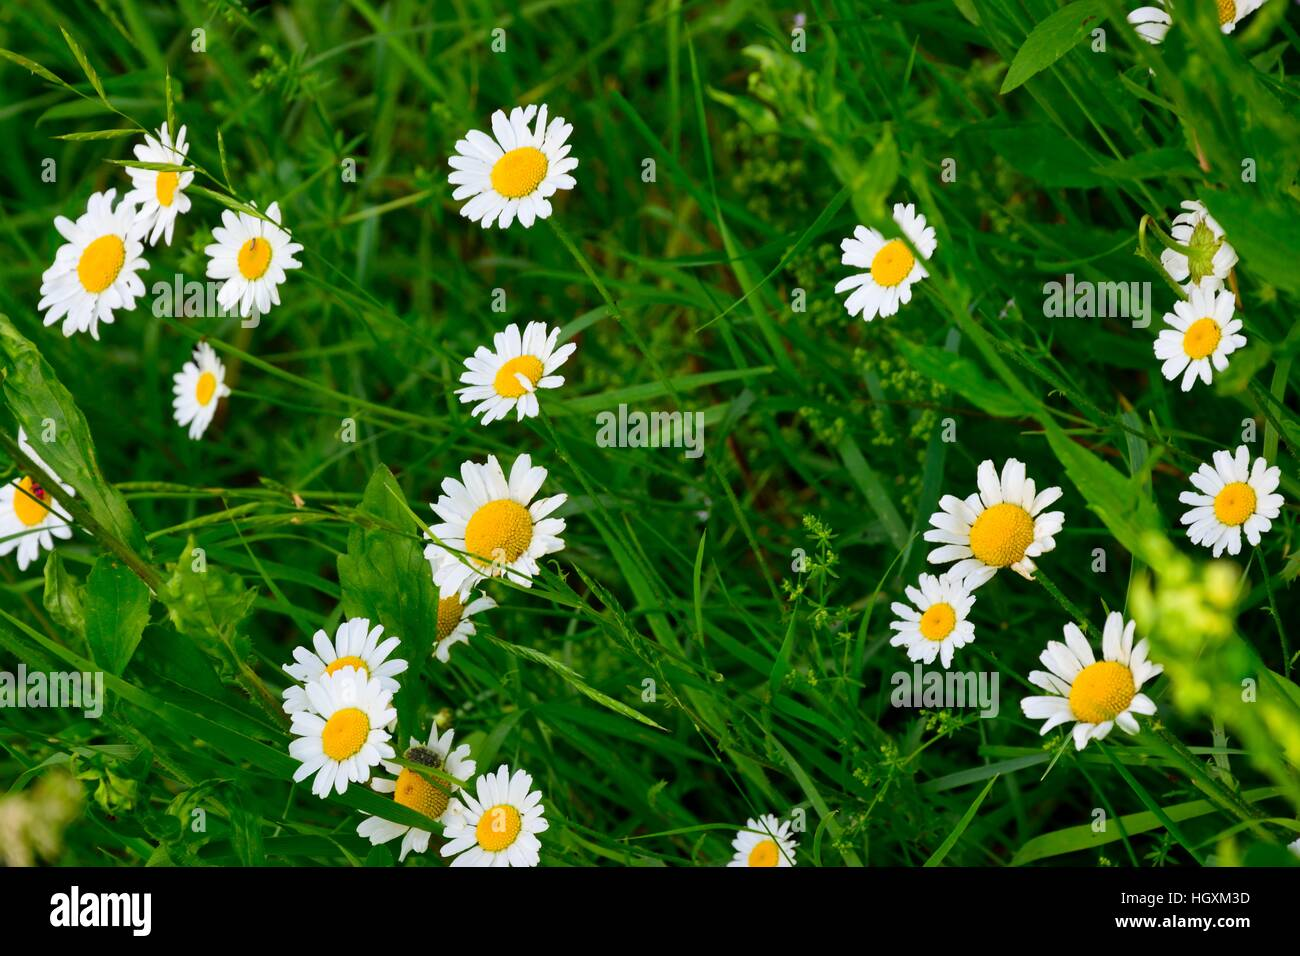 Flowers margaritas amid greenery - Stock Image